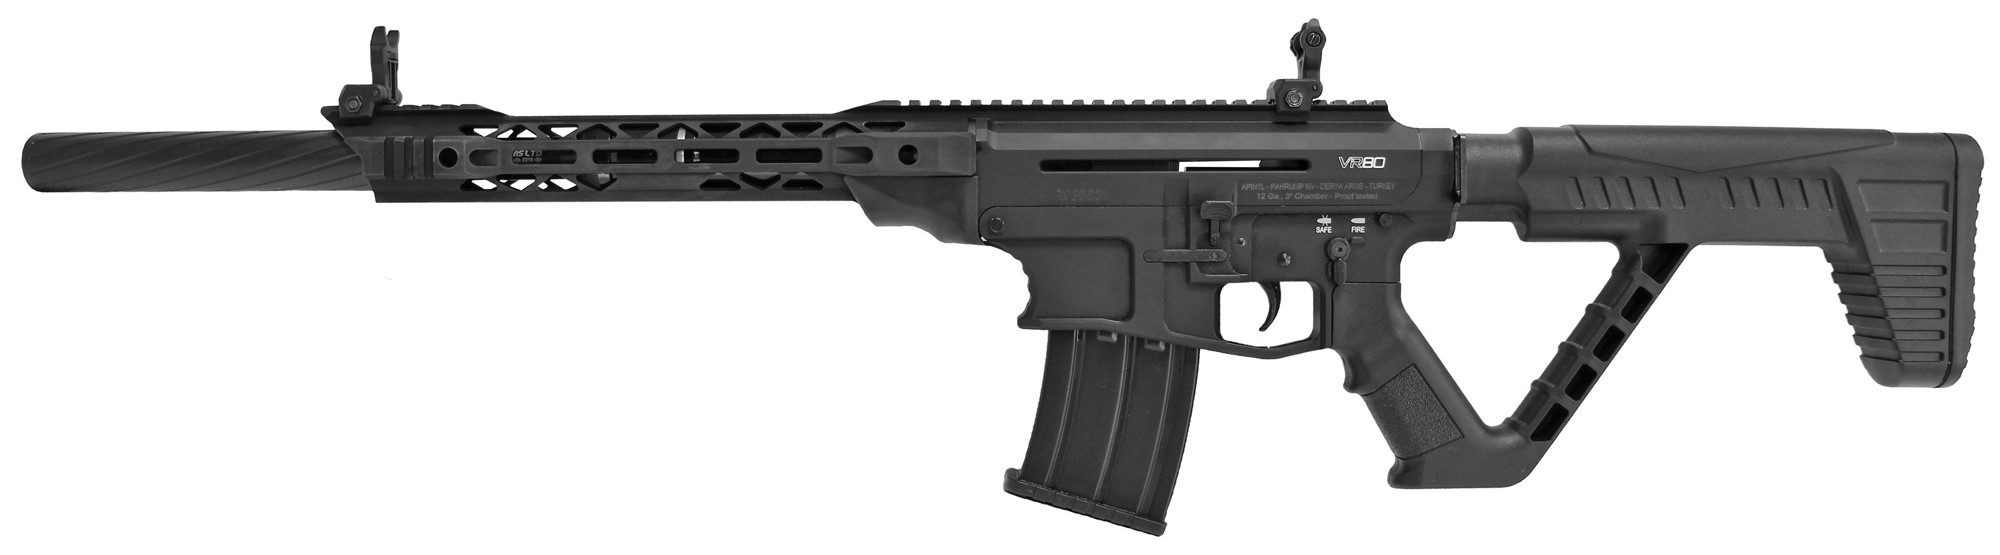 Rock Island Armory VR80 12ga Shotgun · DK Firearms